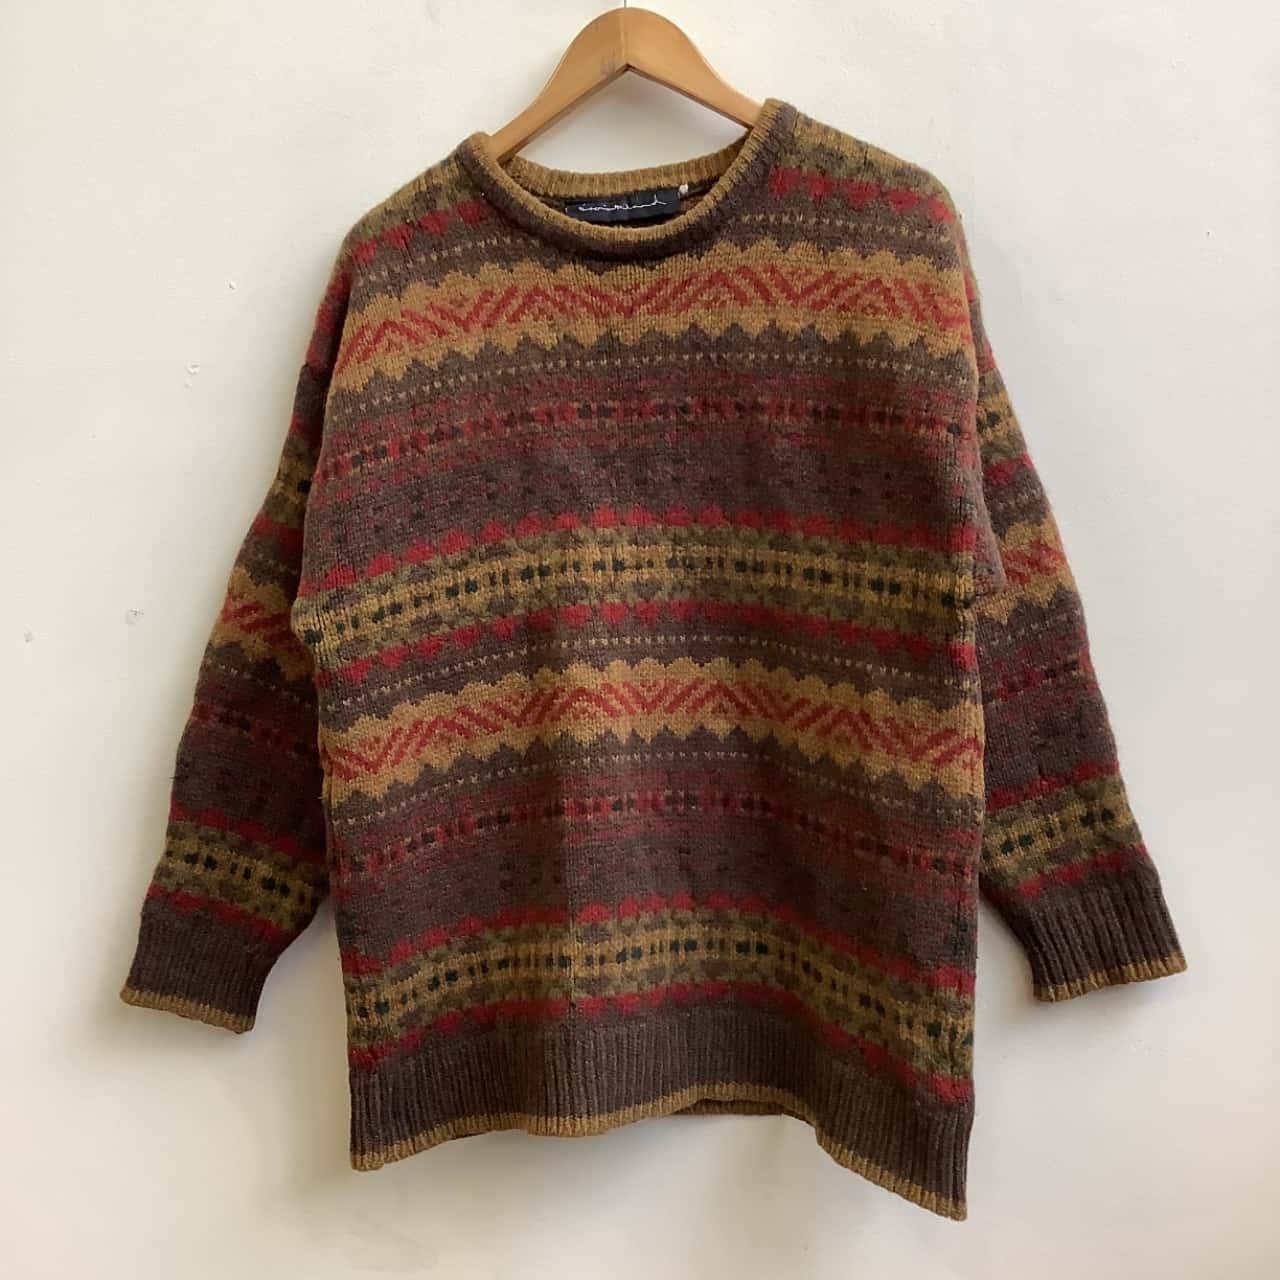 Brookland Mens Brown/Multicoloured  Woollen Knit Jumper